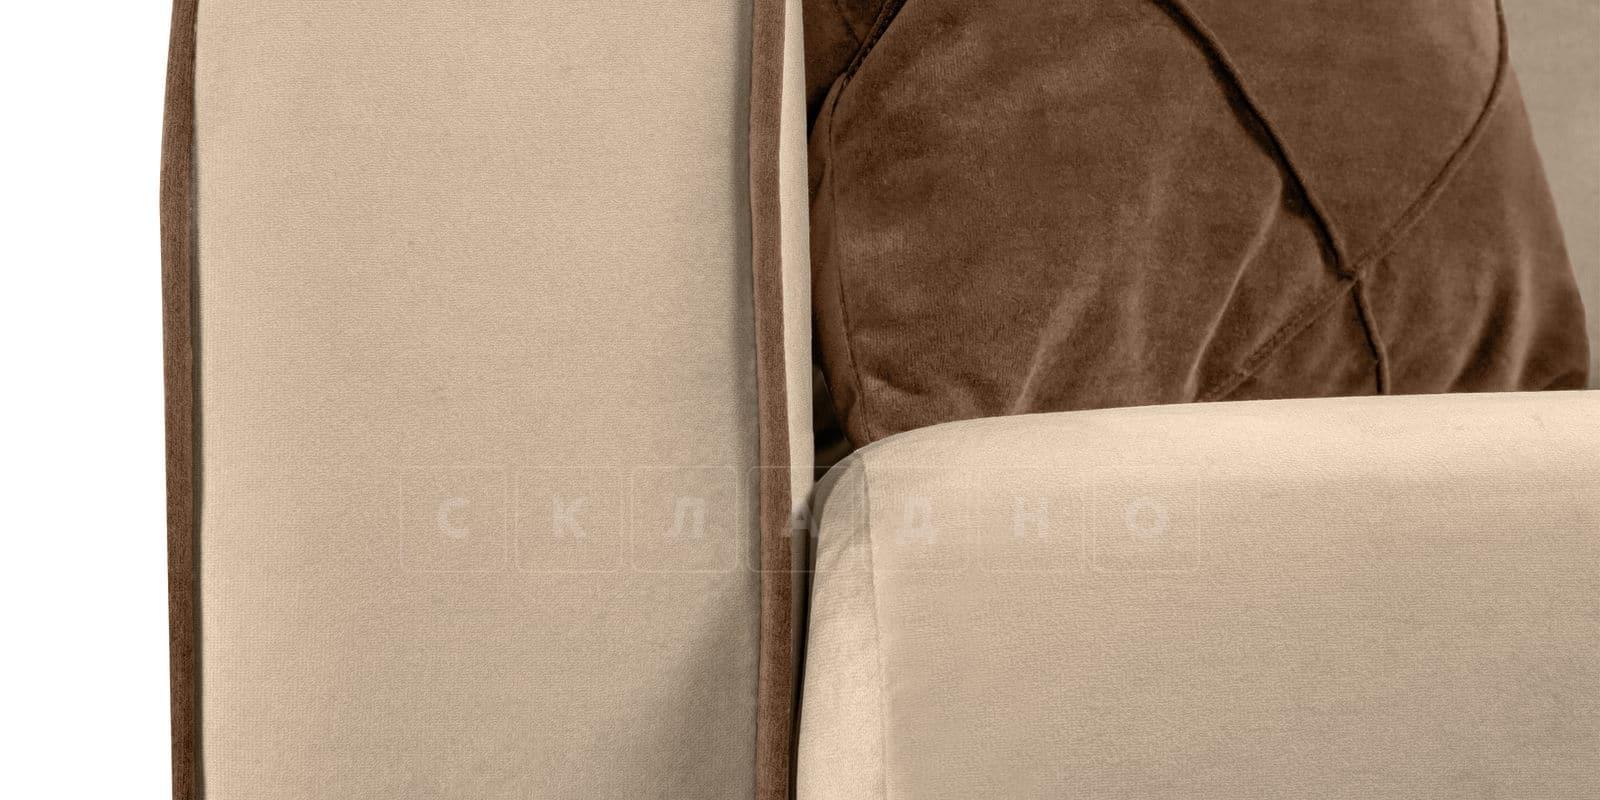 Диван Флэтфорд велюр бежевый фото 6   интернет-магазин Складно